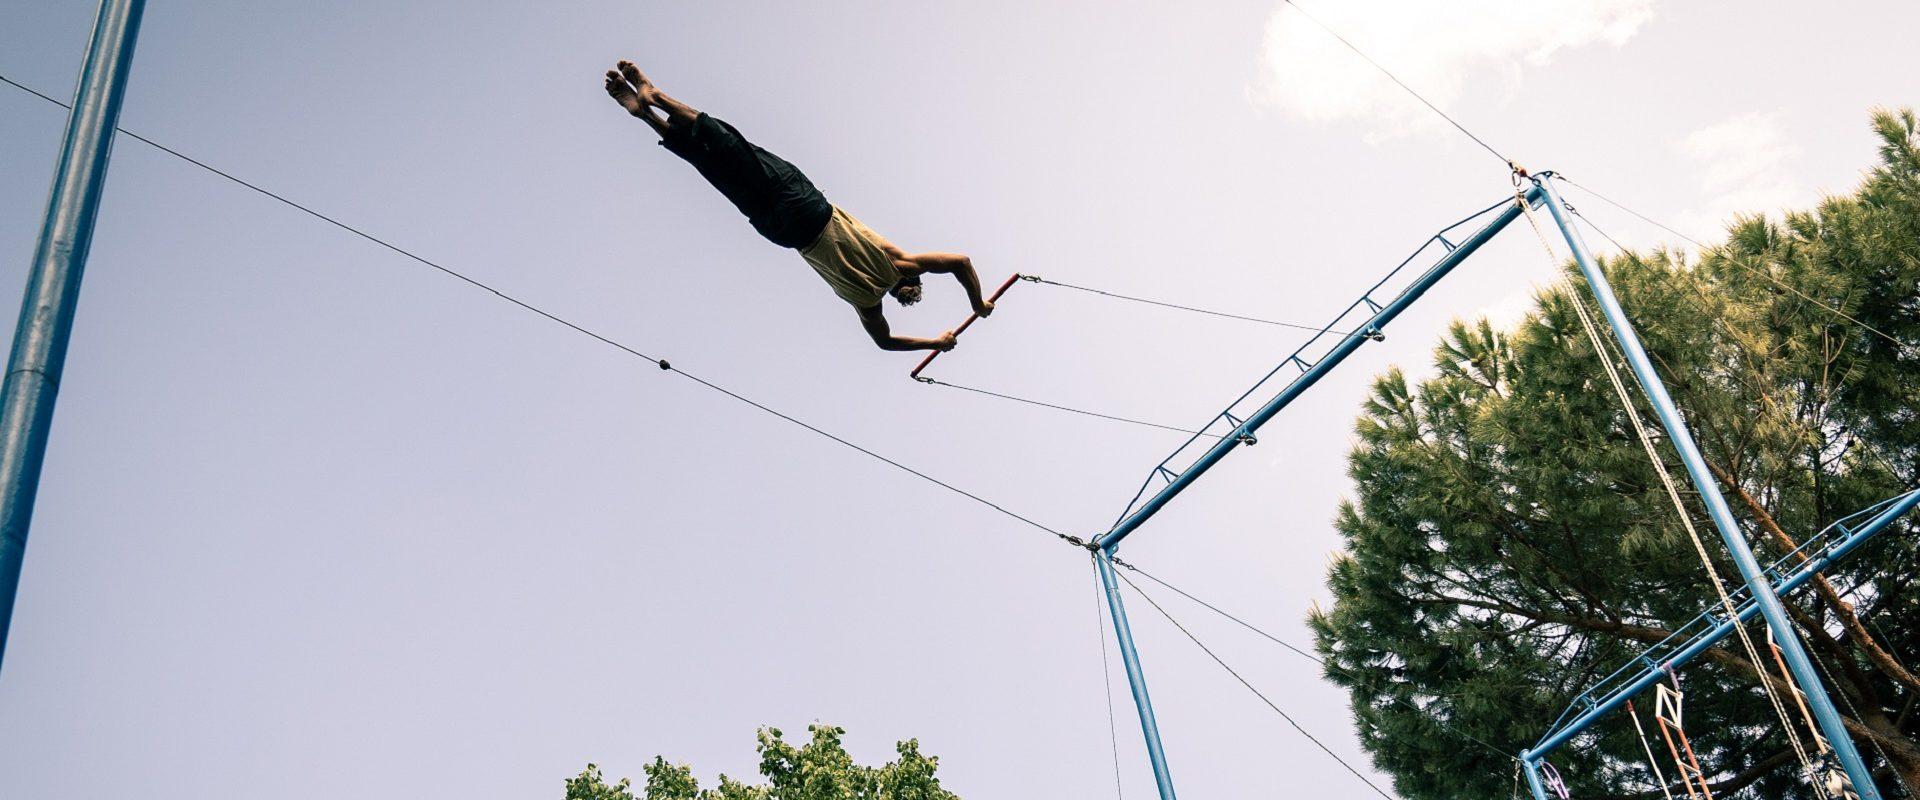 trapecista volando